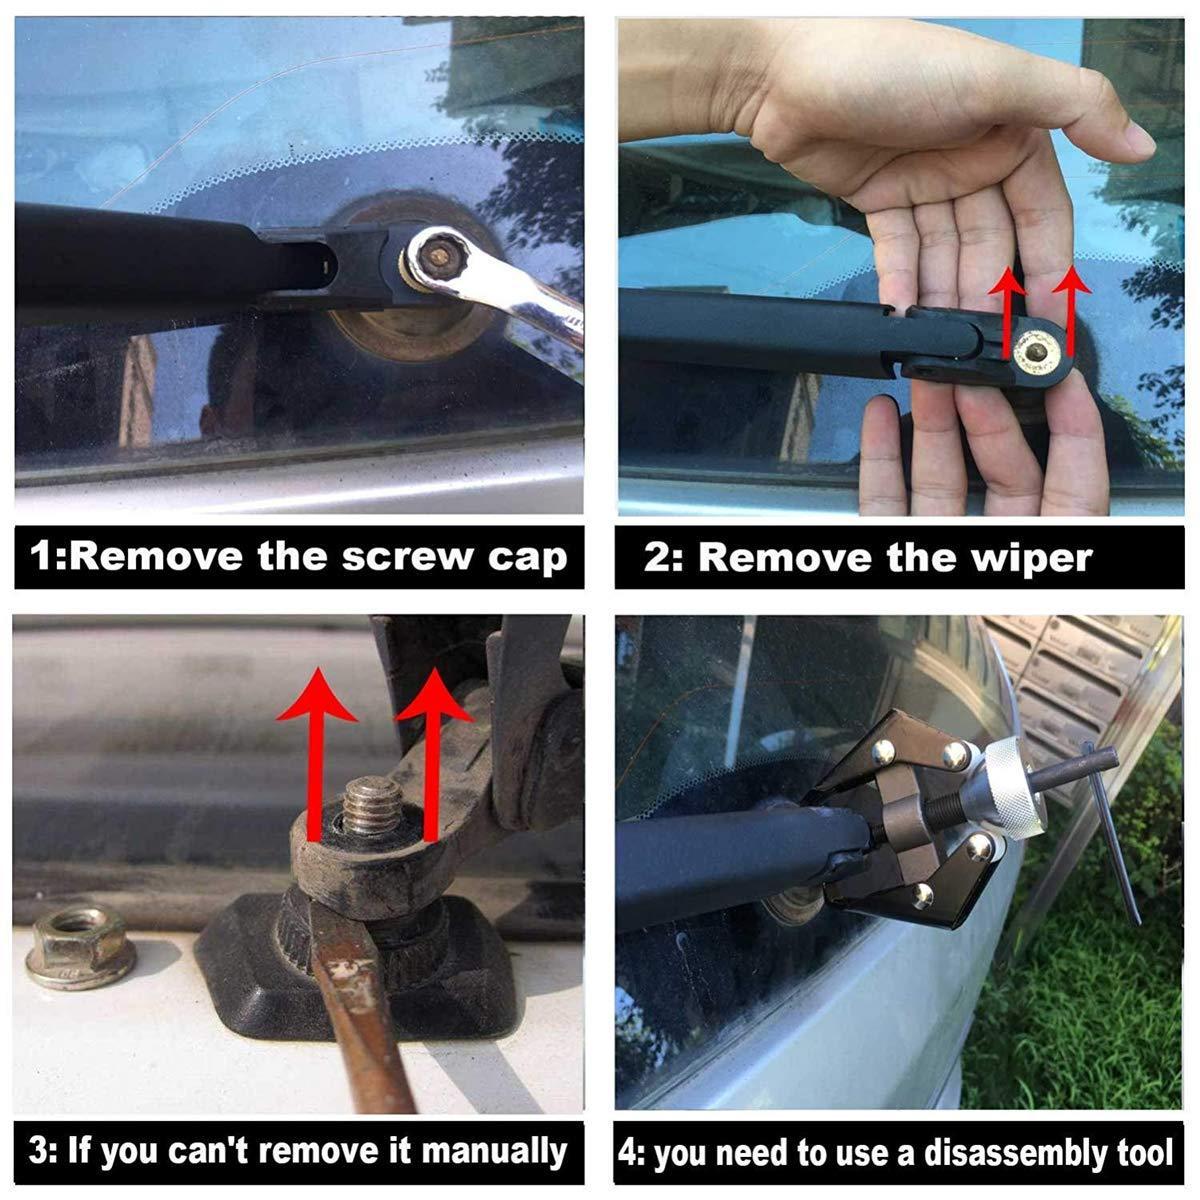 68040371A// 68079868AA// 85241-42070 AUTVAN Rear Windsheild Back Wiper Arm and Blade Set for Jeep Grand Cherokee 2011-2015 Toyota Land Cruiser Lexus LX570 2008-2015 GX470 2003-2009 Arm Rear Wiper OE